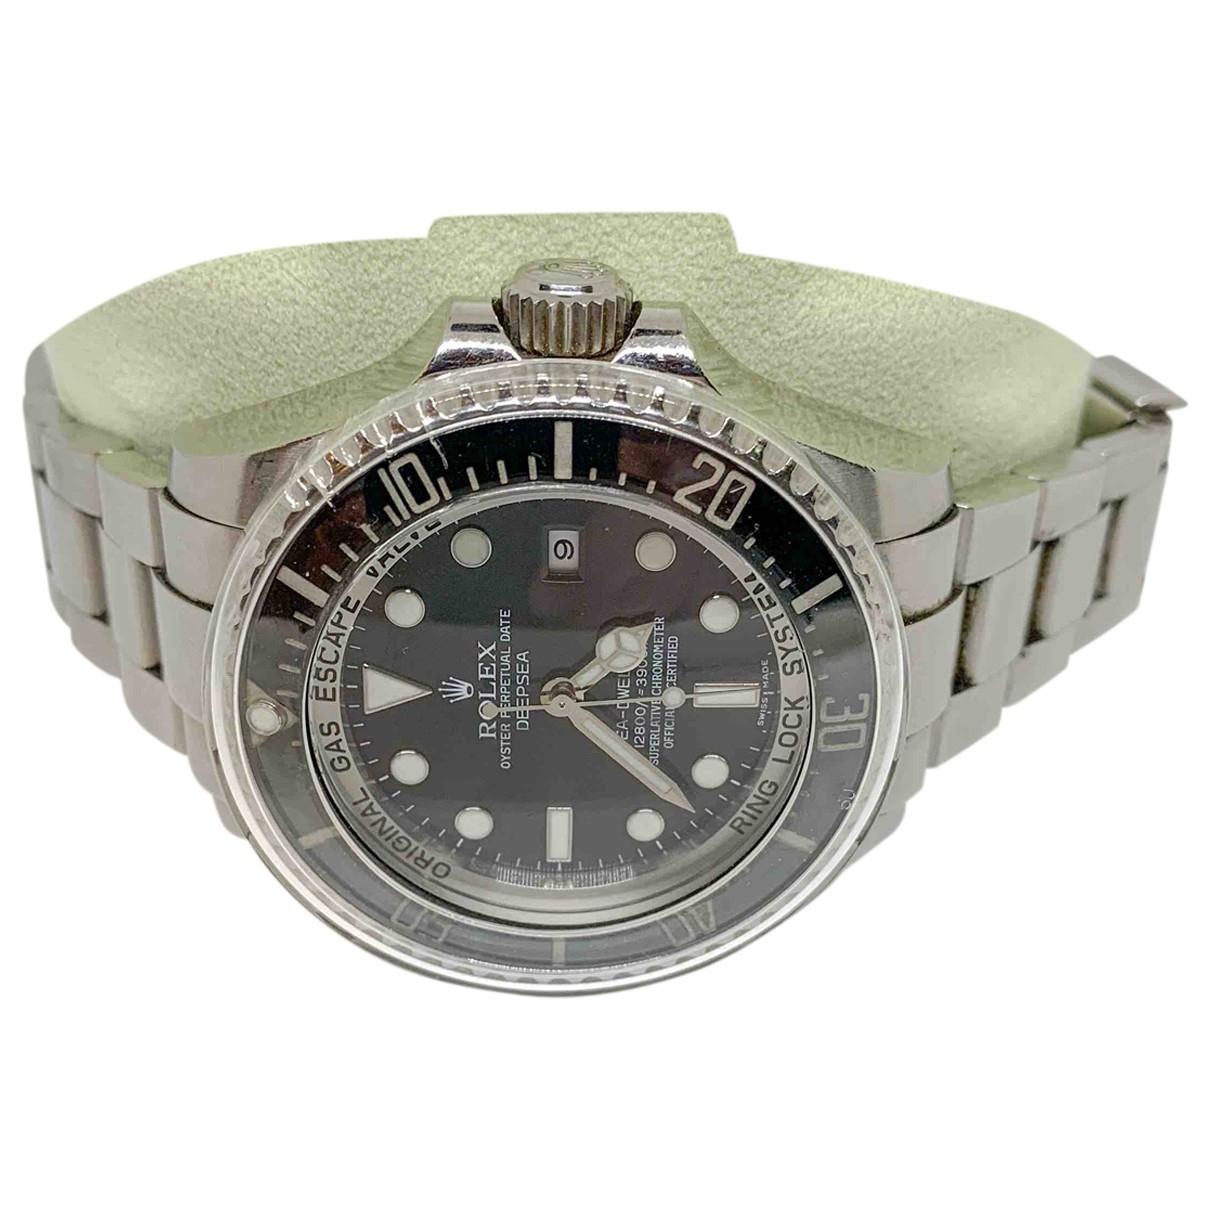 Relojes Deepsea Rolex